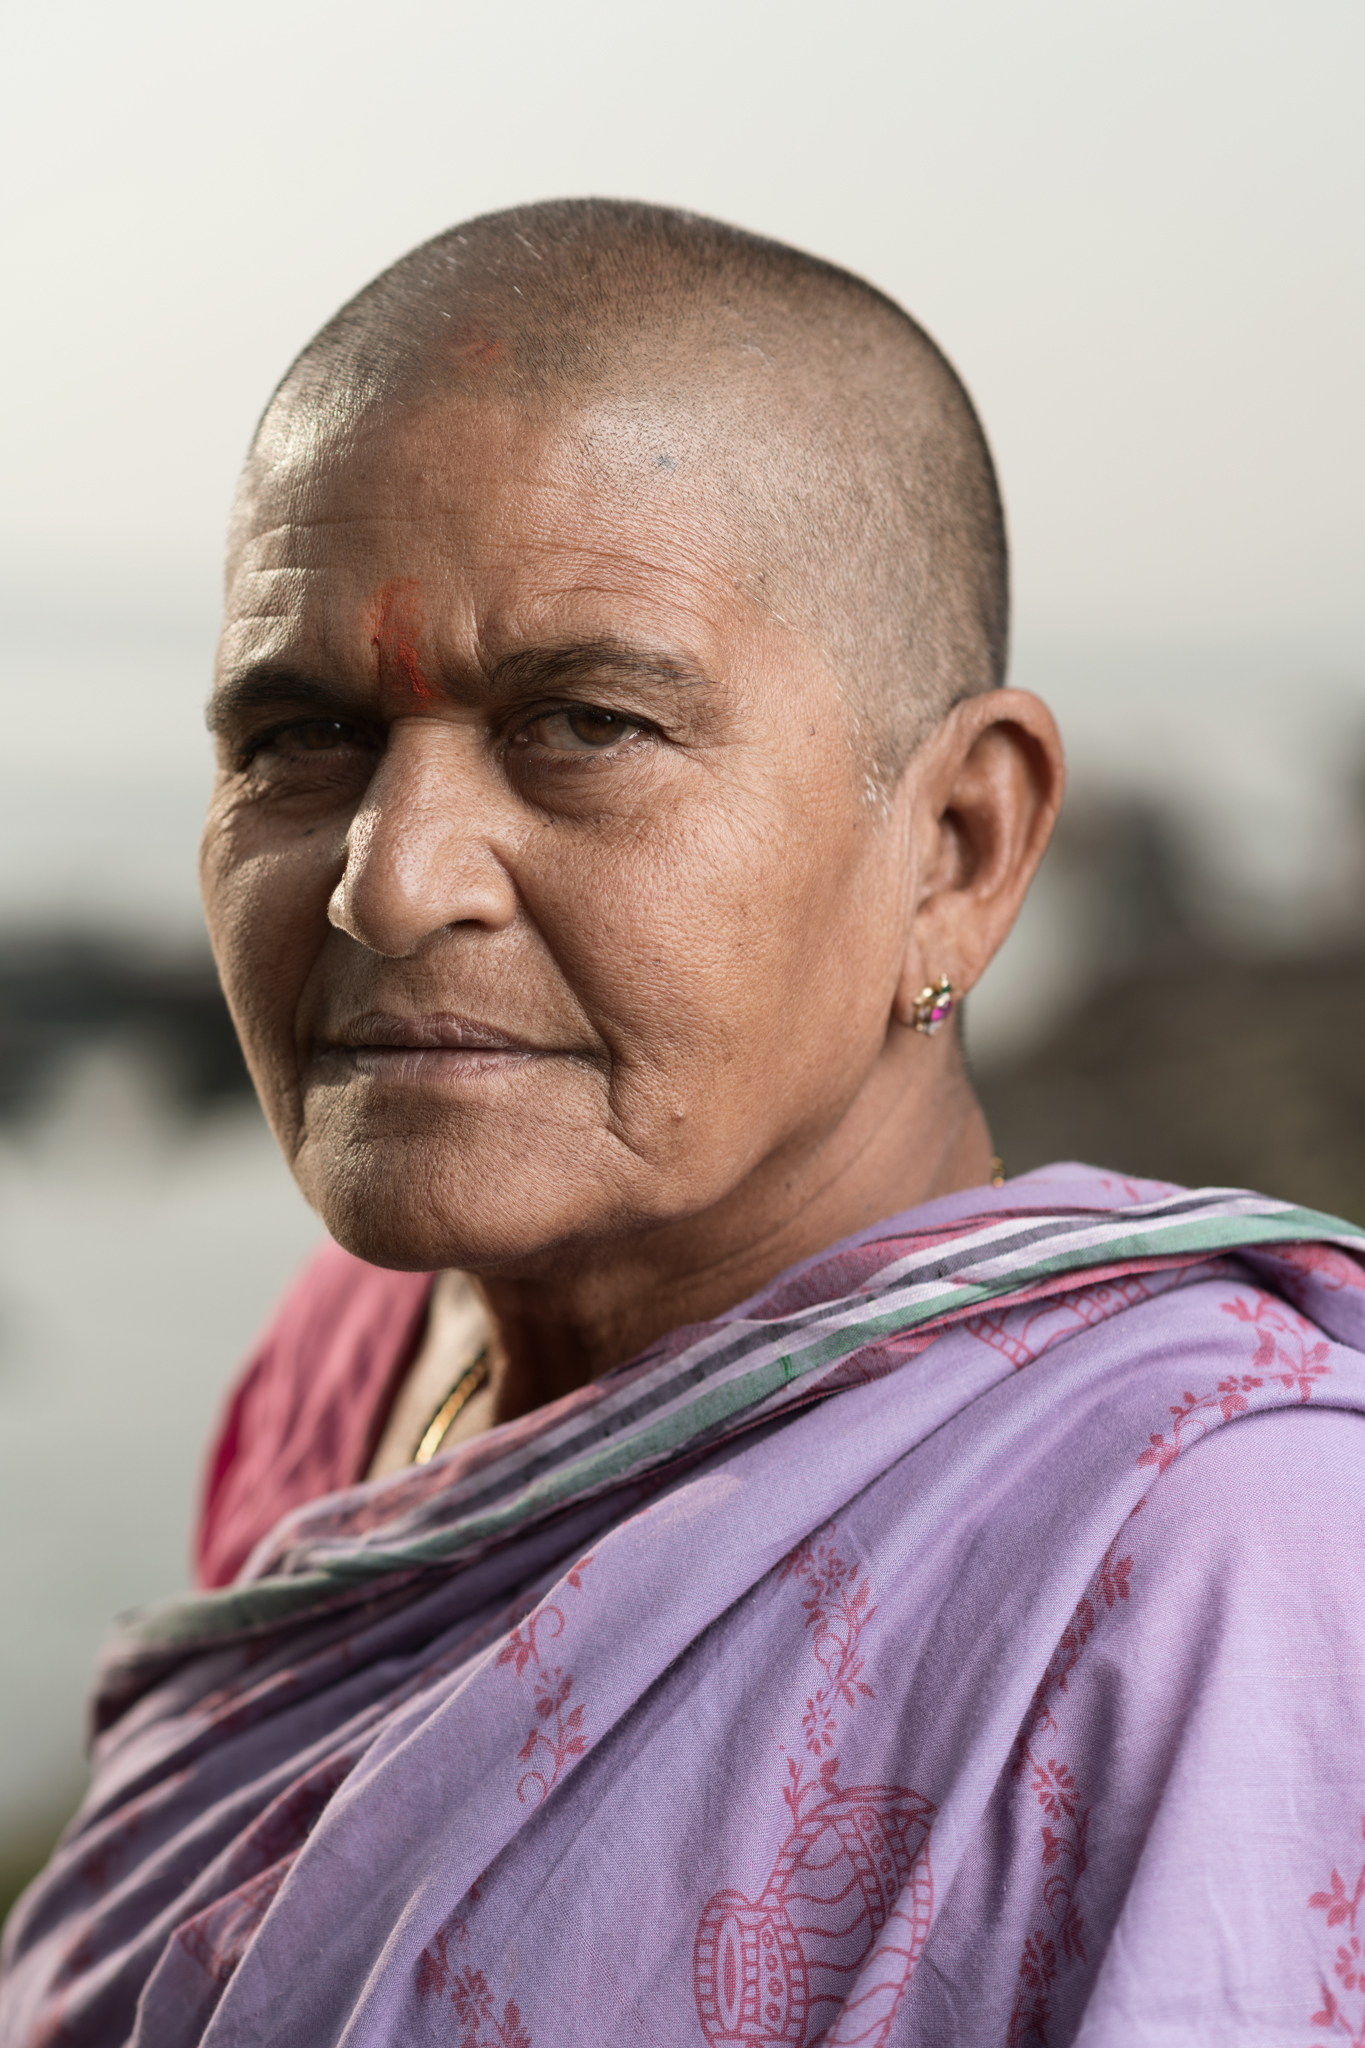 Varanasi_portrait_travel_photography_Manchester_Adventure_Photographer_Jan_Bella25.jpg